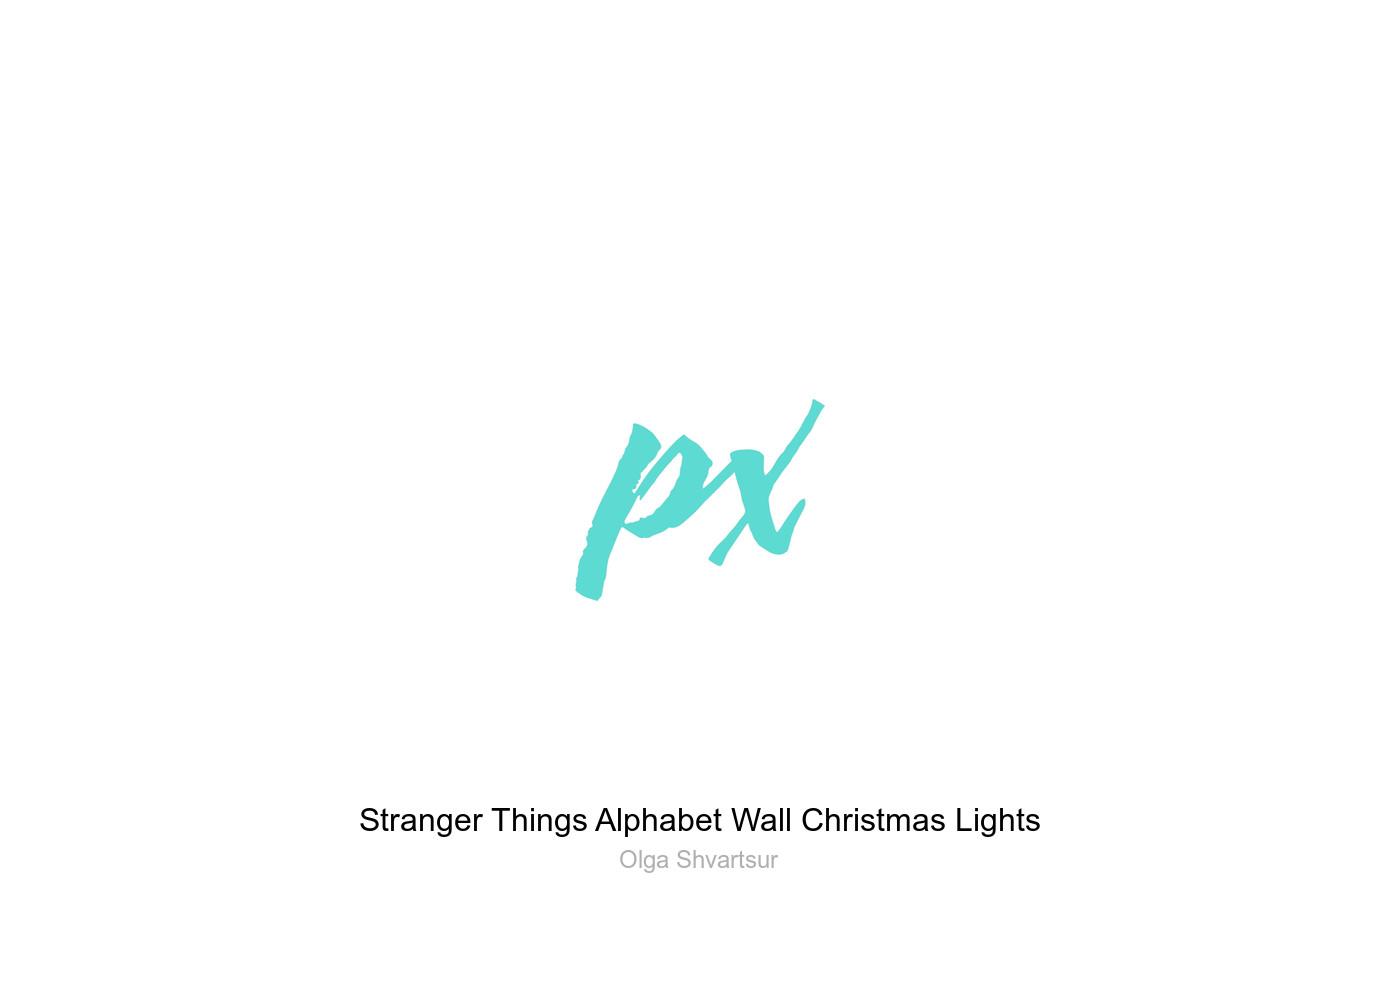 Christmas Lights Stranger Things.Stranger Things Alphabet Wall Christmas Lights Greeting Card